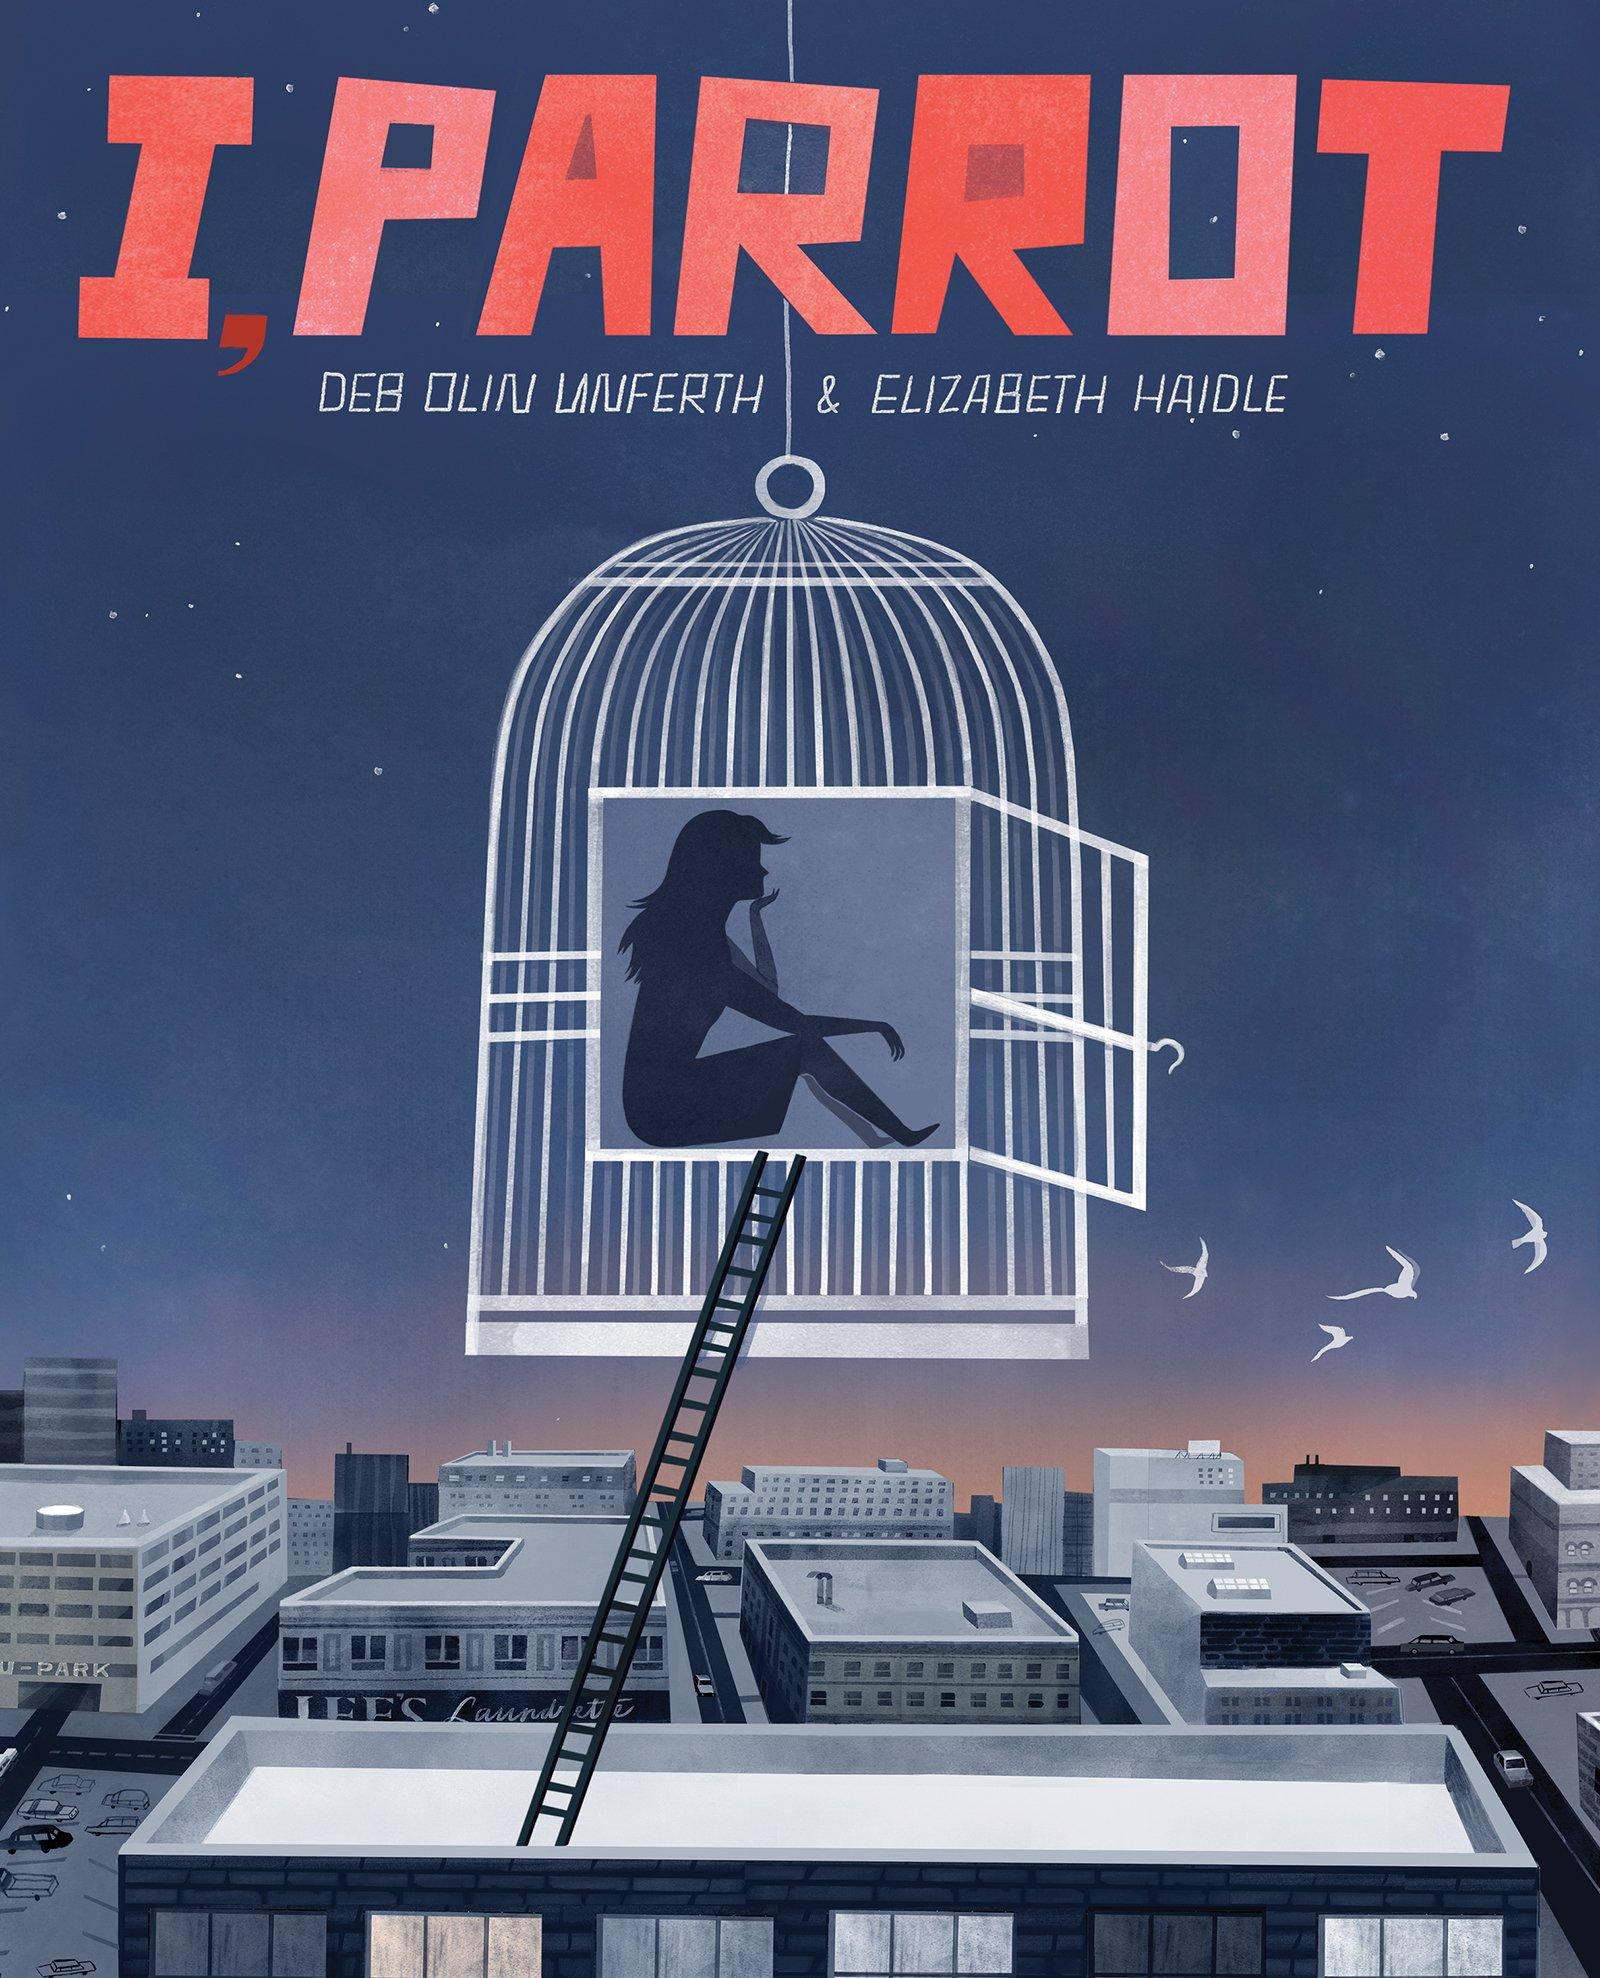 i, parrot graphic novel